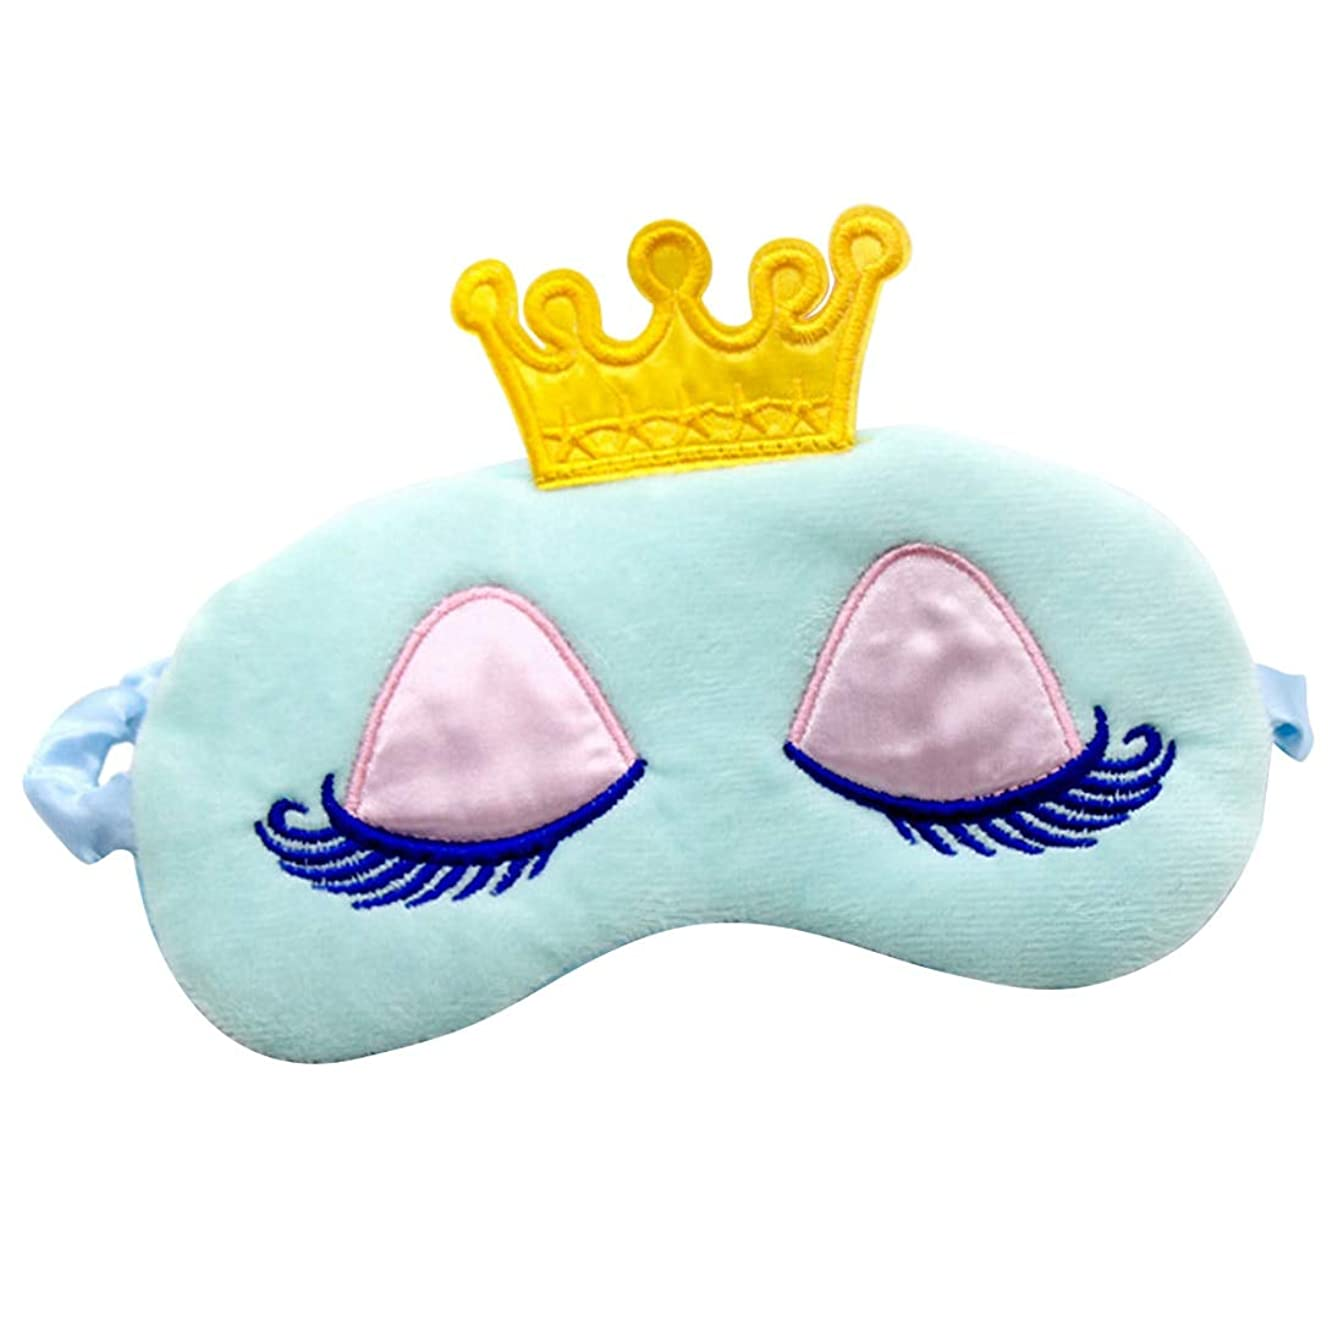 NOTE ピンク/ブルークラウン眠れる森の美女アイシェードアイカバースリーピングマスク/トラベル/ホームロングまつげ目隠しかわいいアイカバー